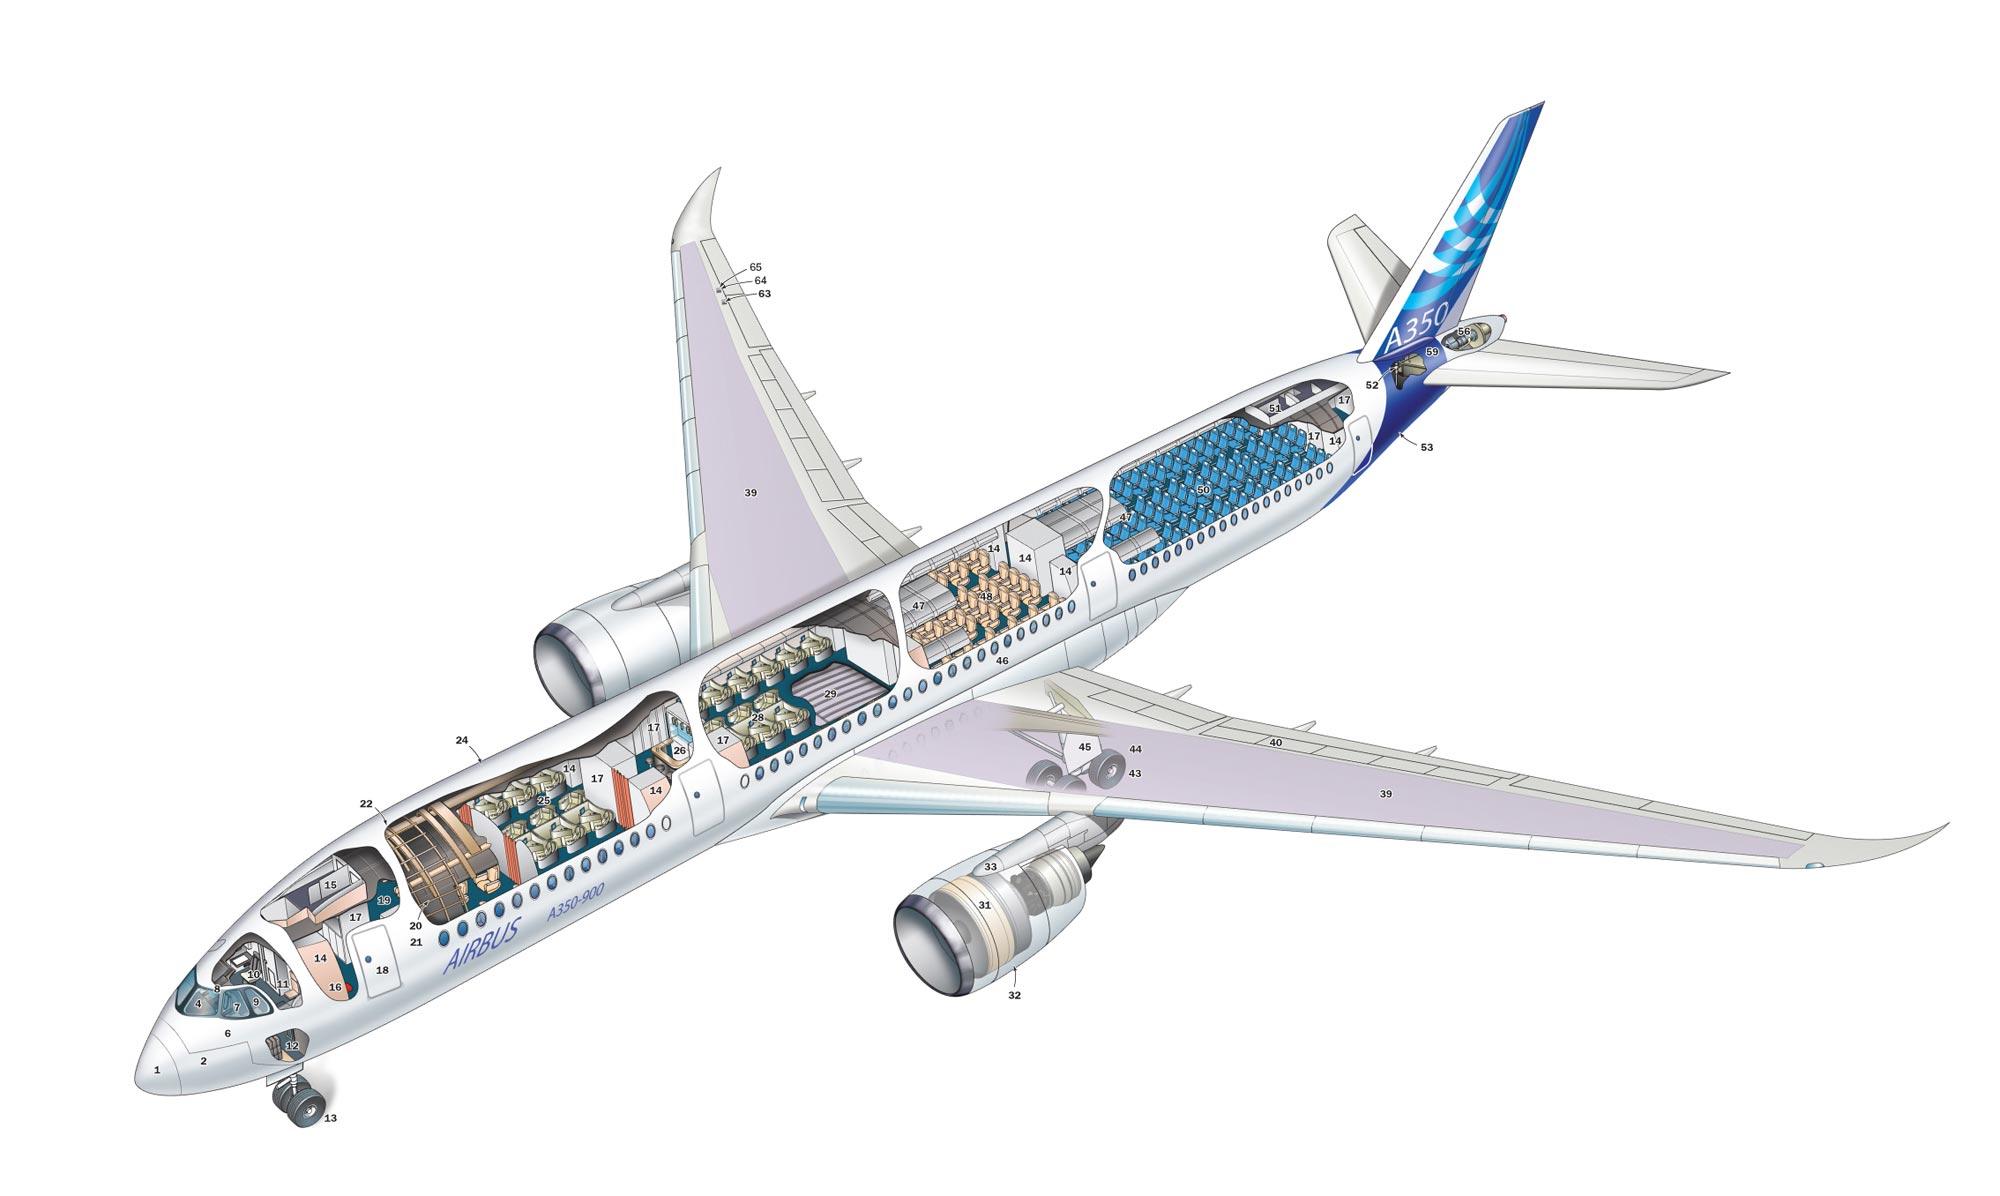 Airbus A350 cutaway